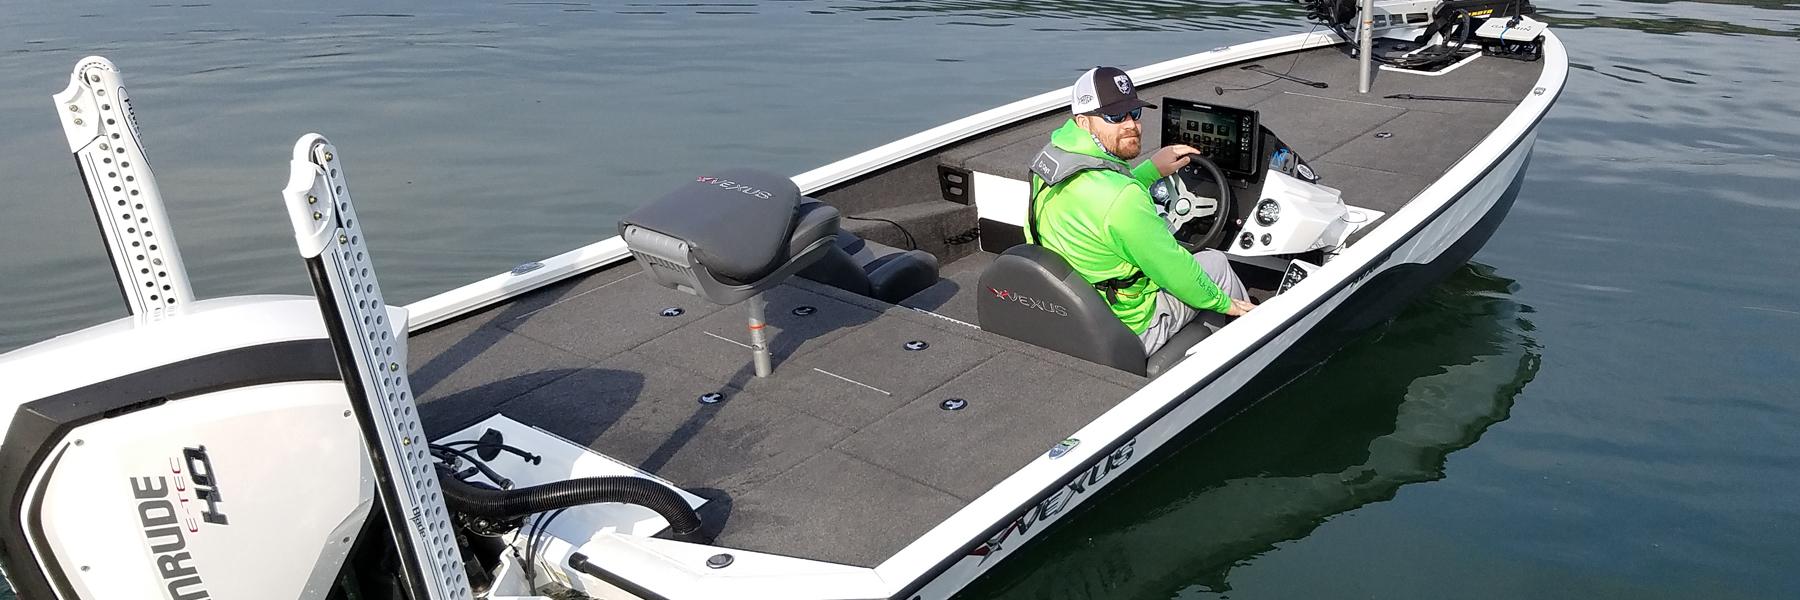 Texas bass angler - new vexus boat